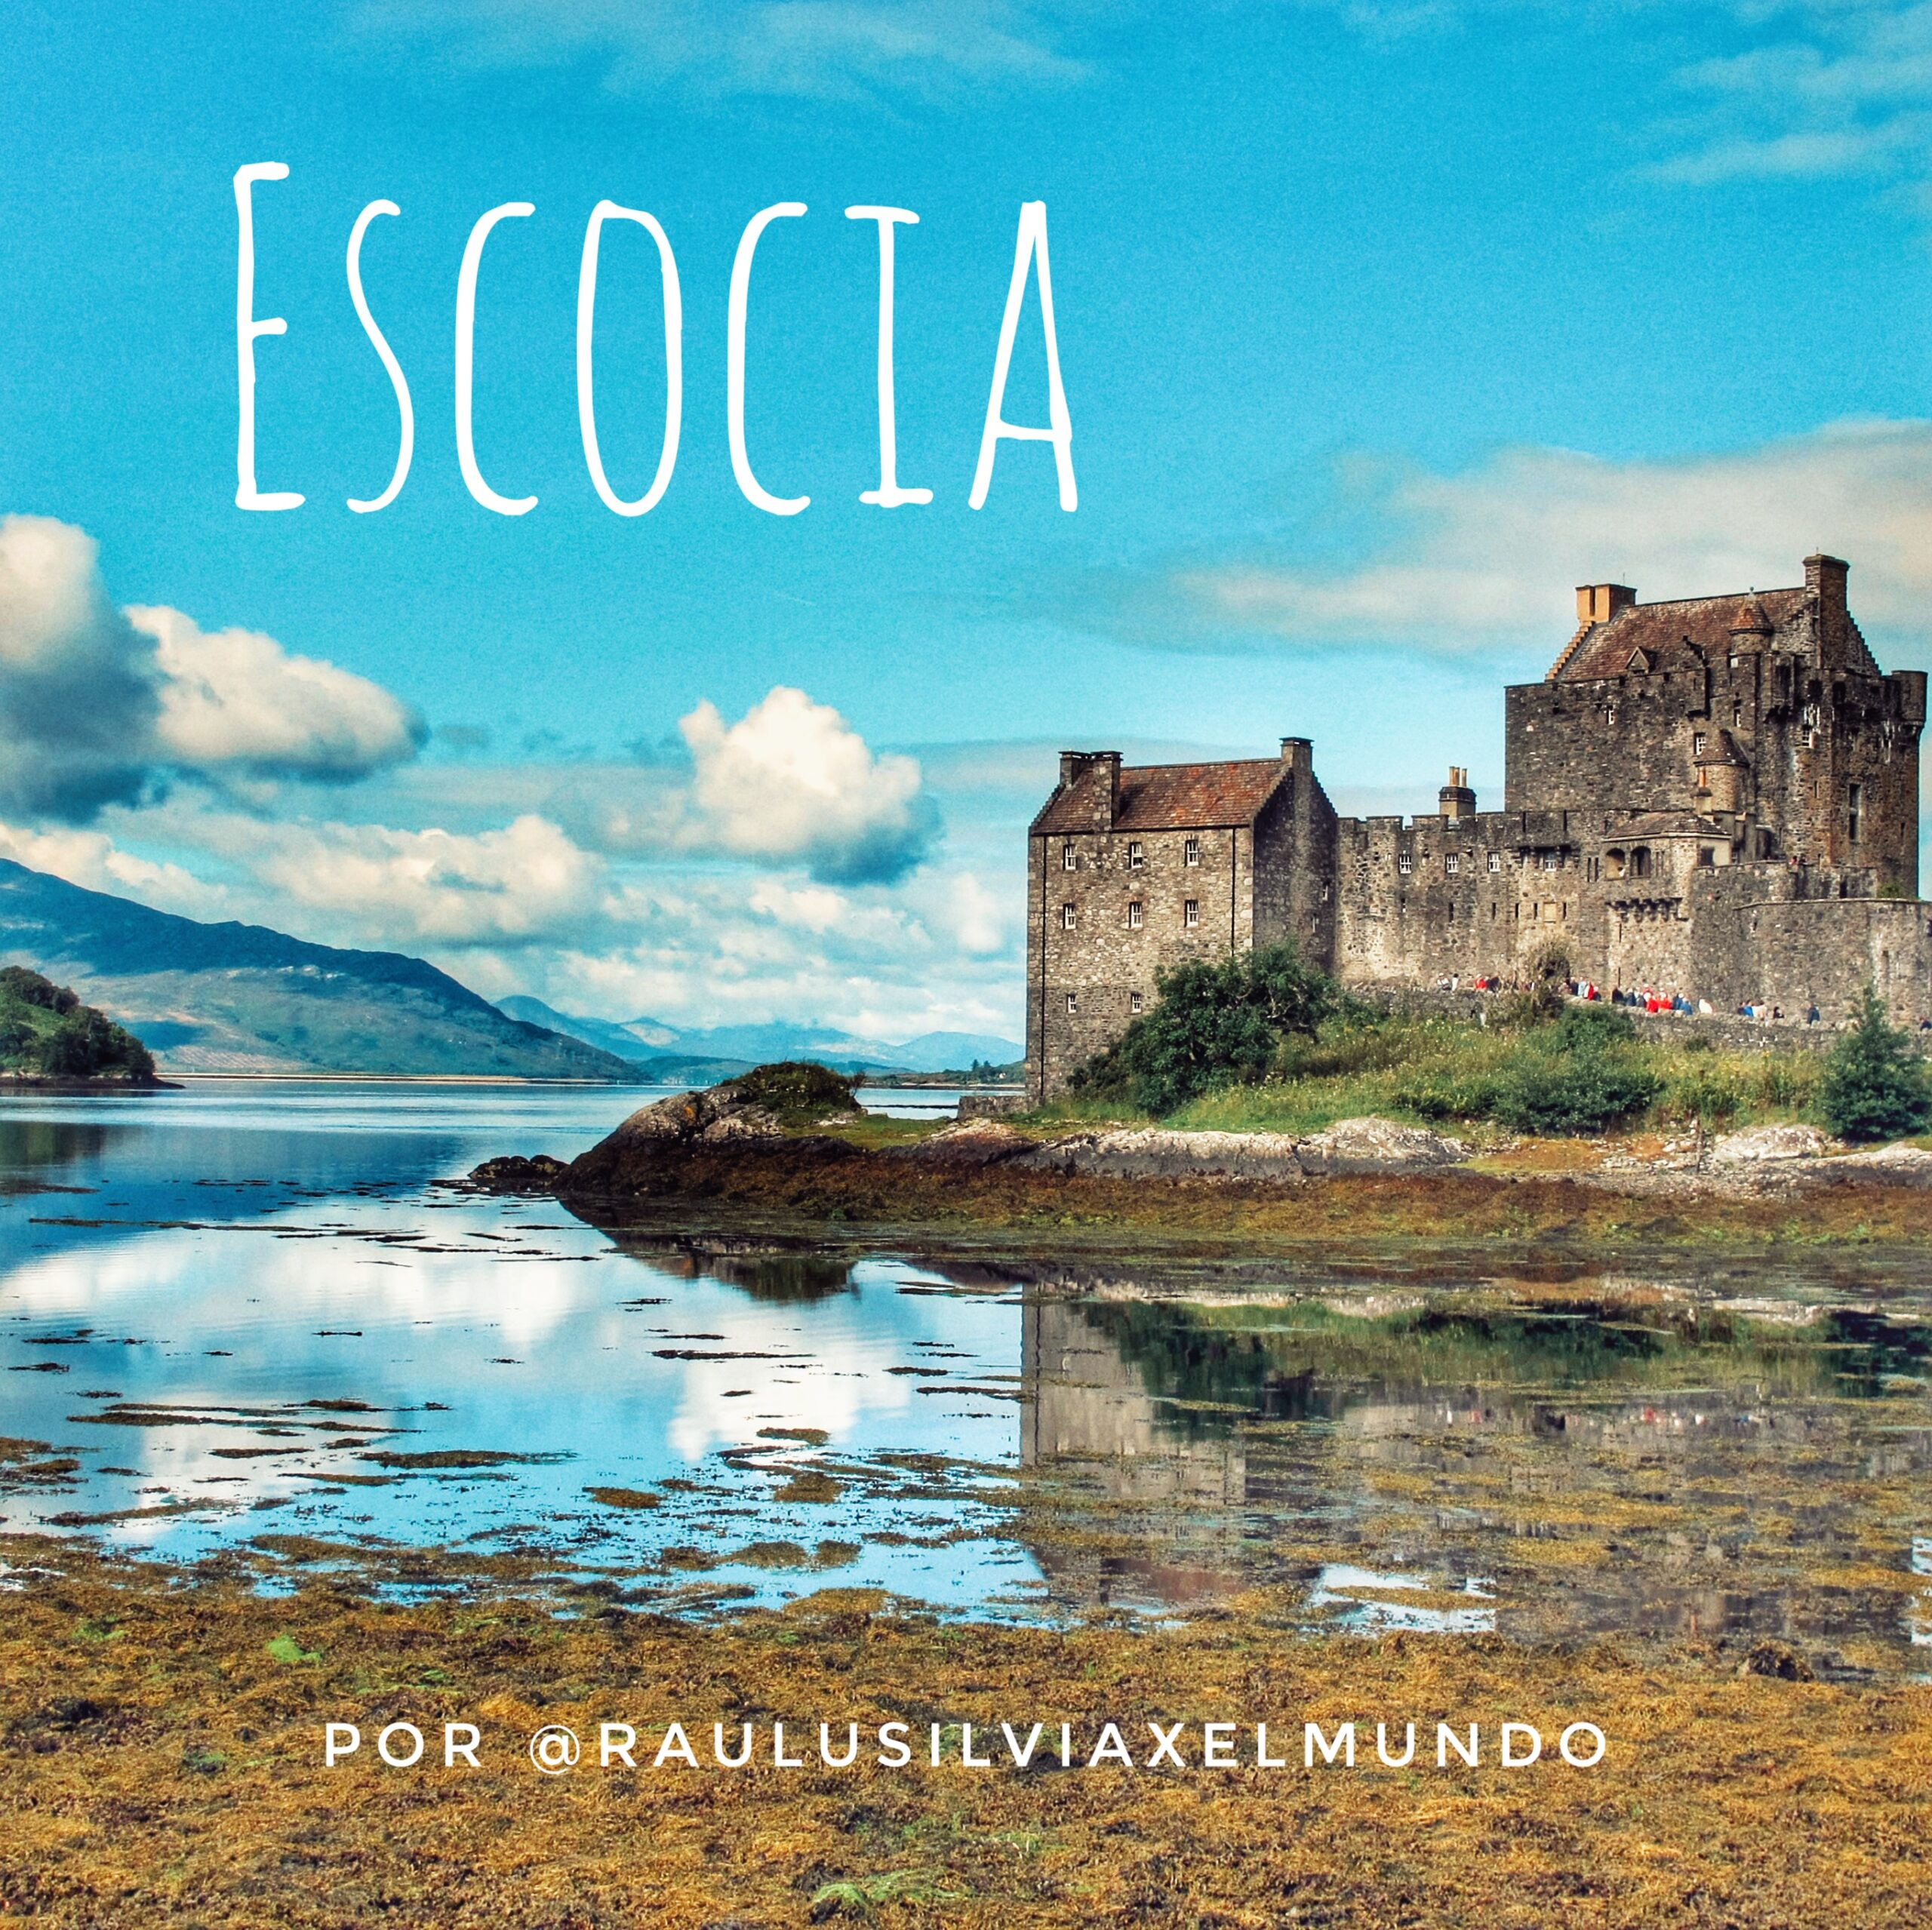 L'Écosse en camping-car ou en camping-car en 9 étapes par @raulysilviaxelmundo